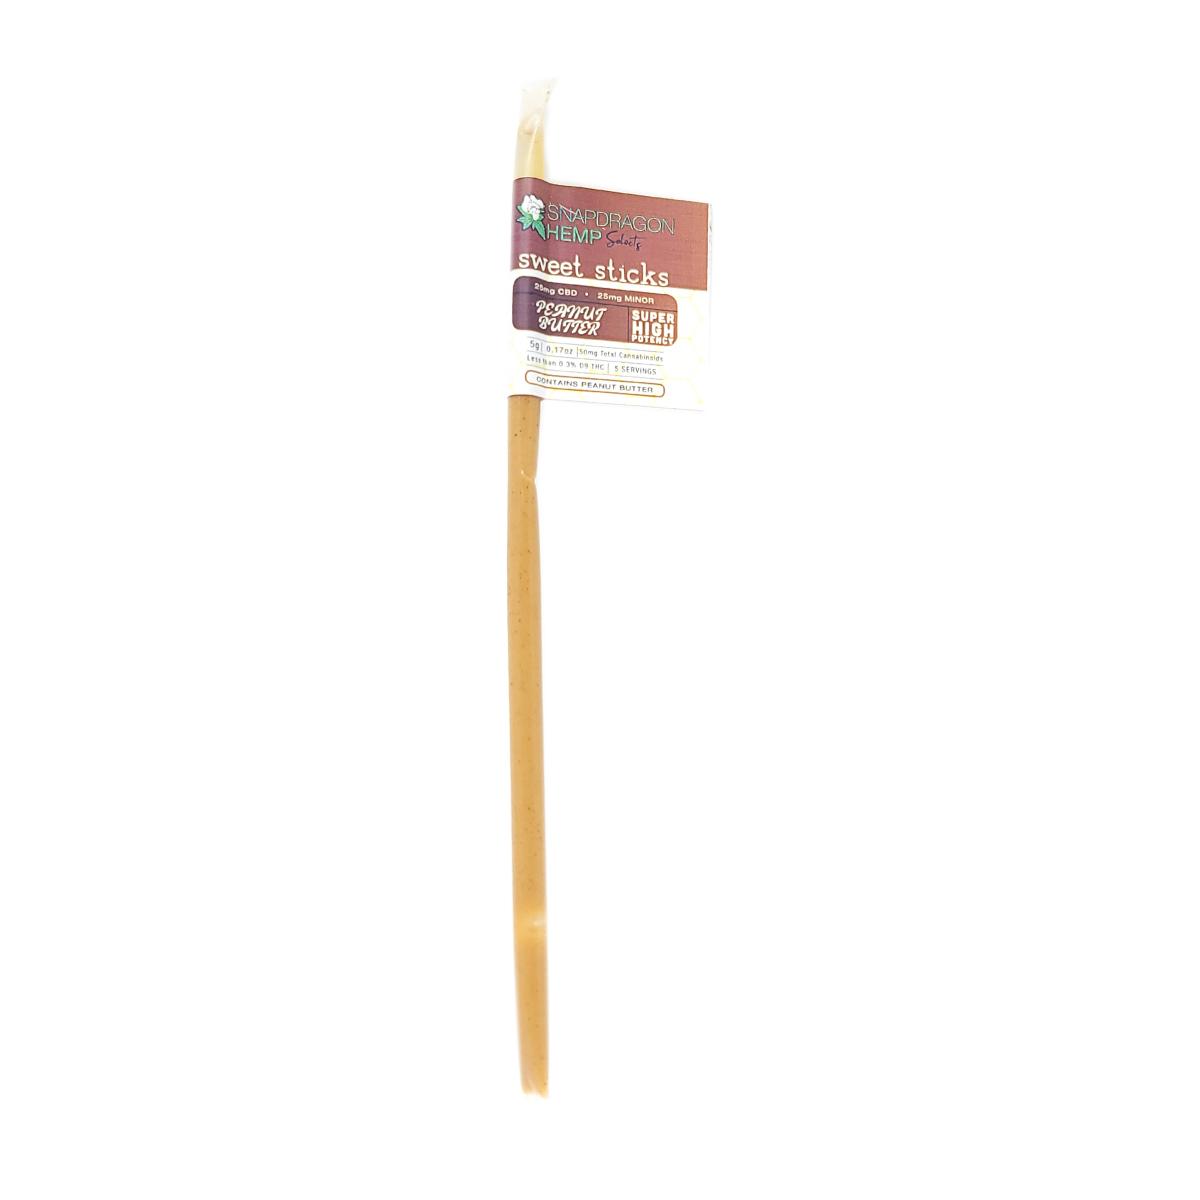 Snapdragon Hemp Delta-8 THC Sweet Sticks -- Peanut Butter -- 50mg